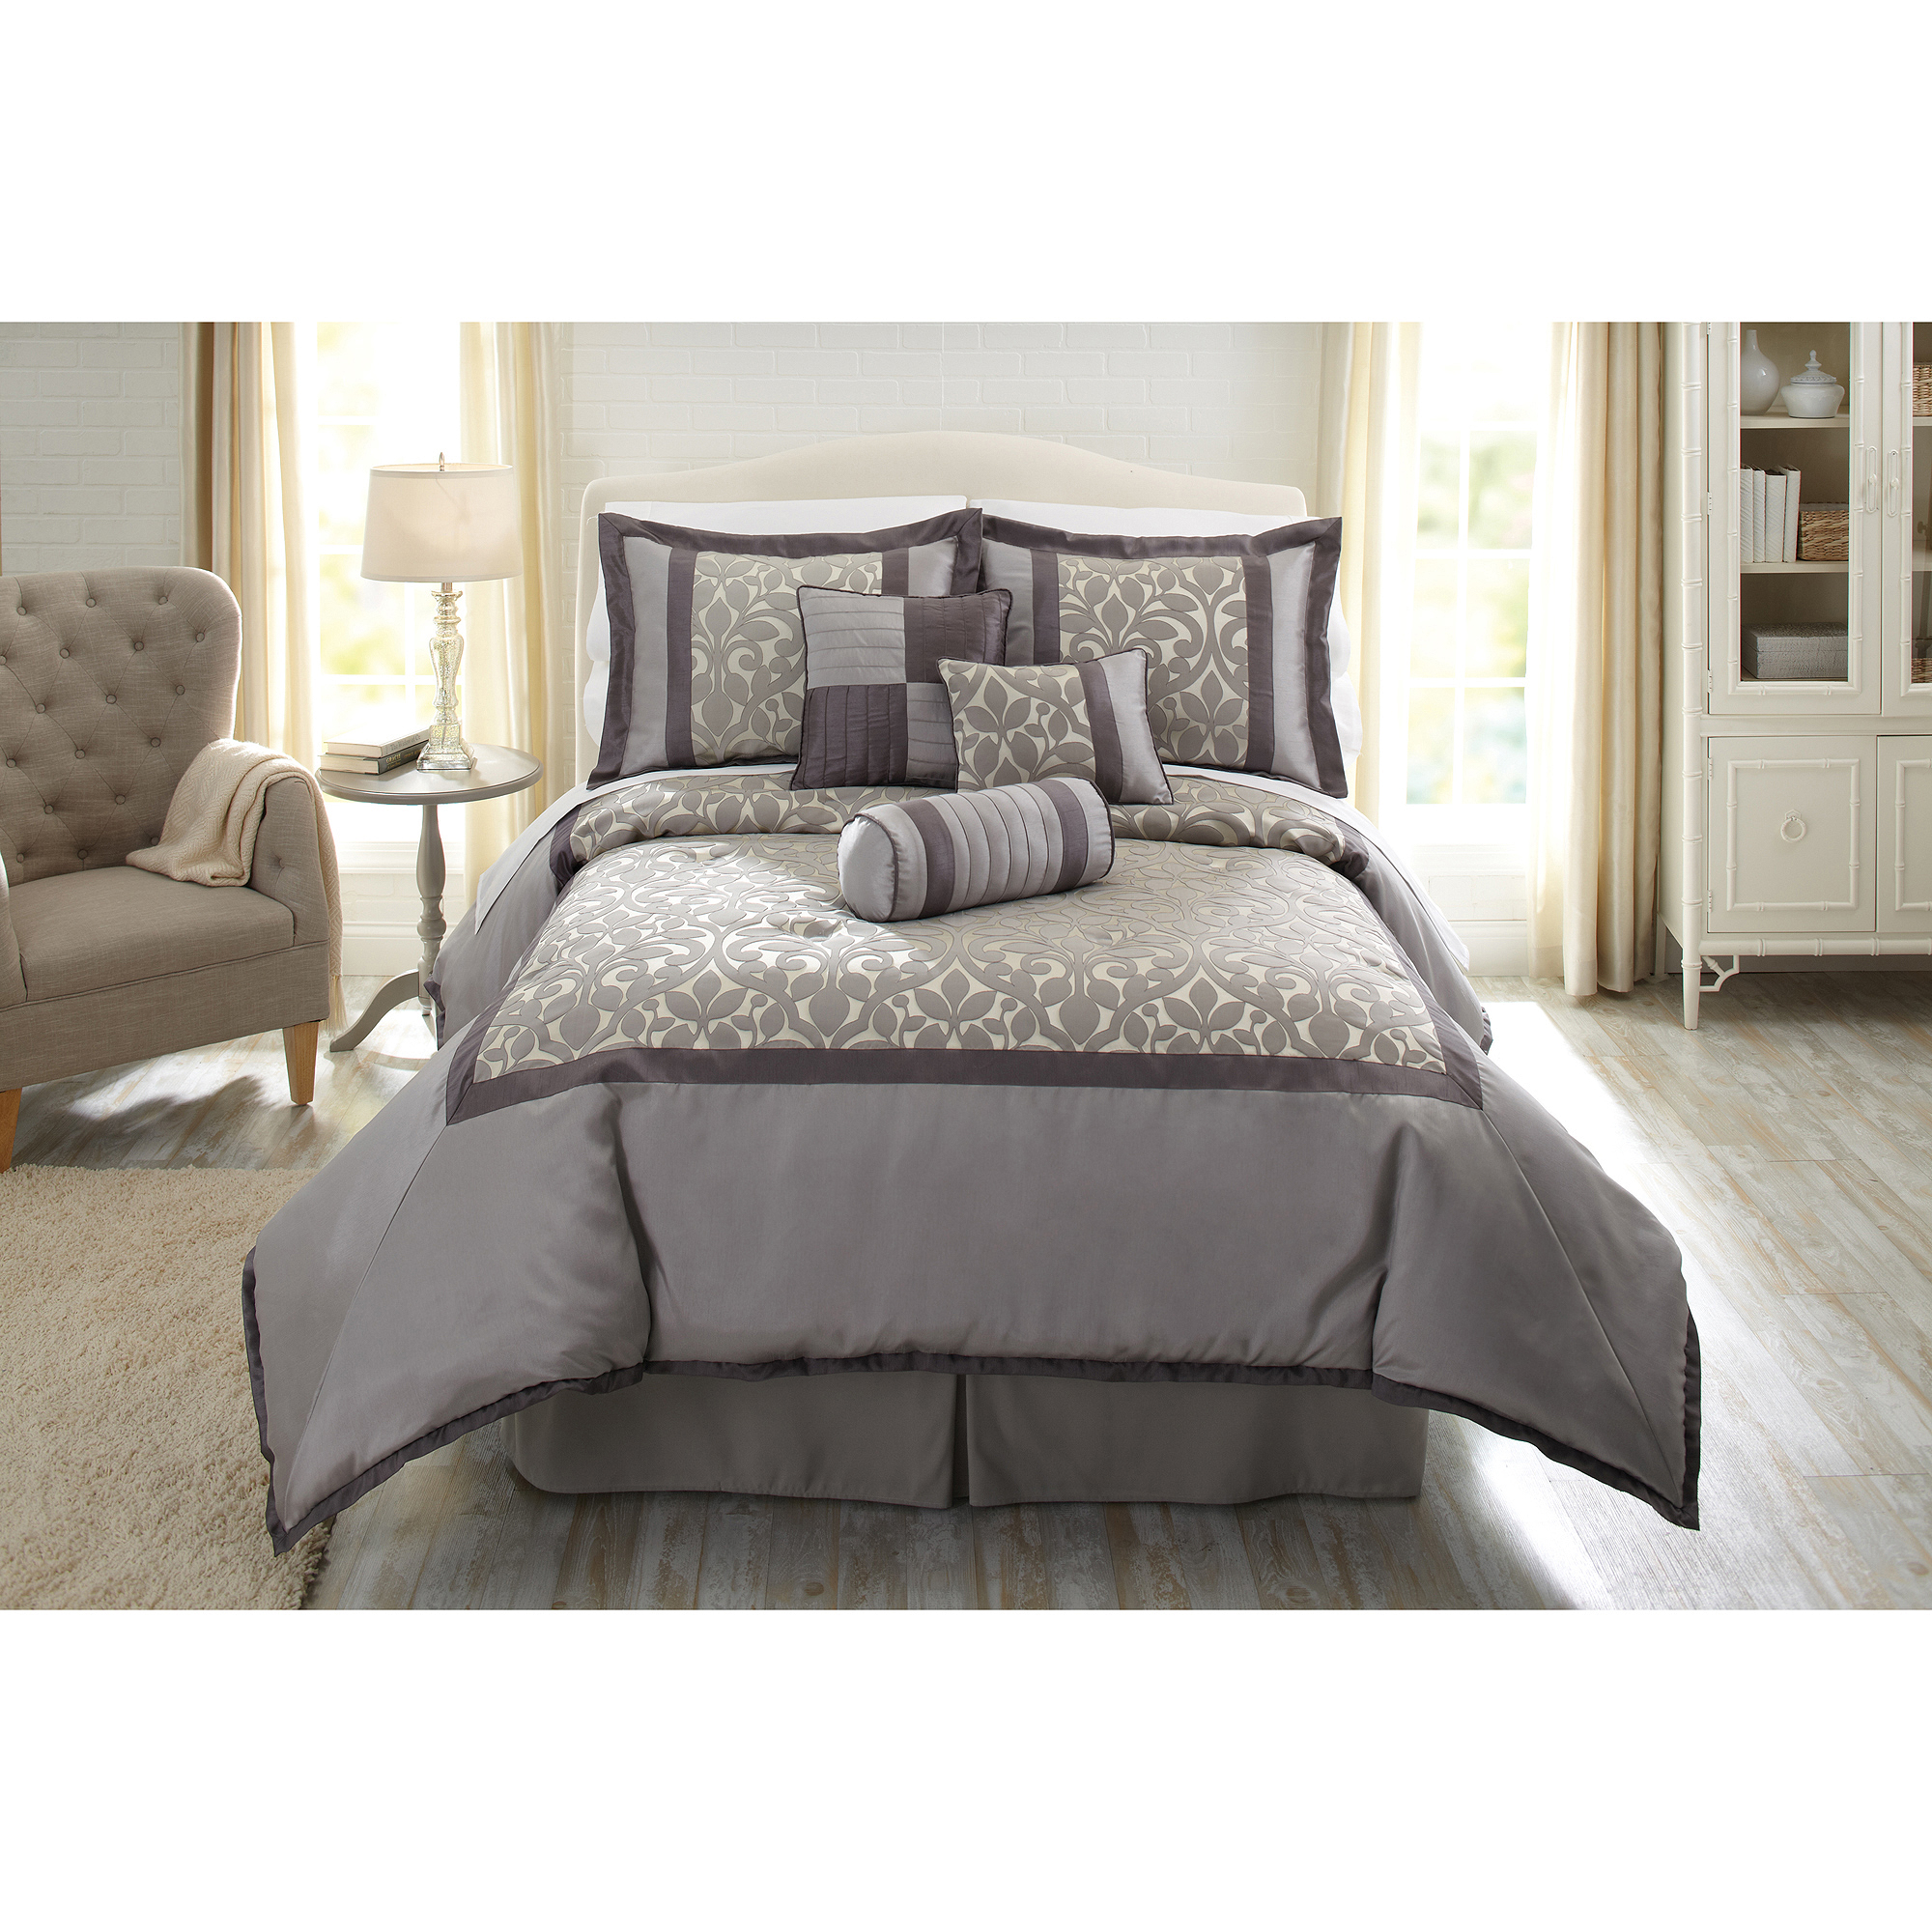 Better Homes and Gardens Natalie 7 Piece Comforter Set